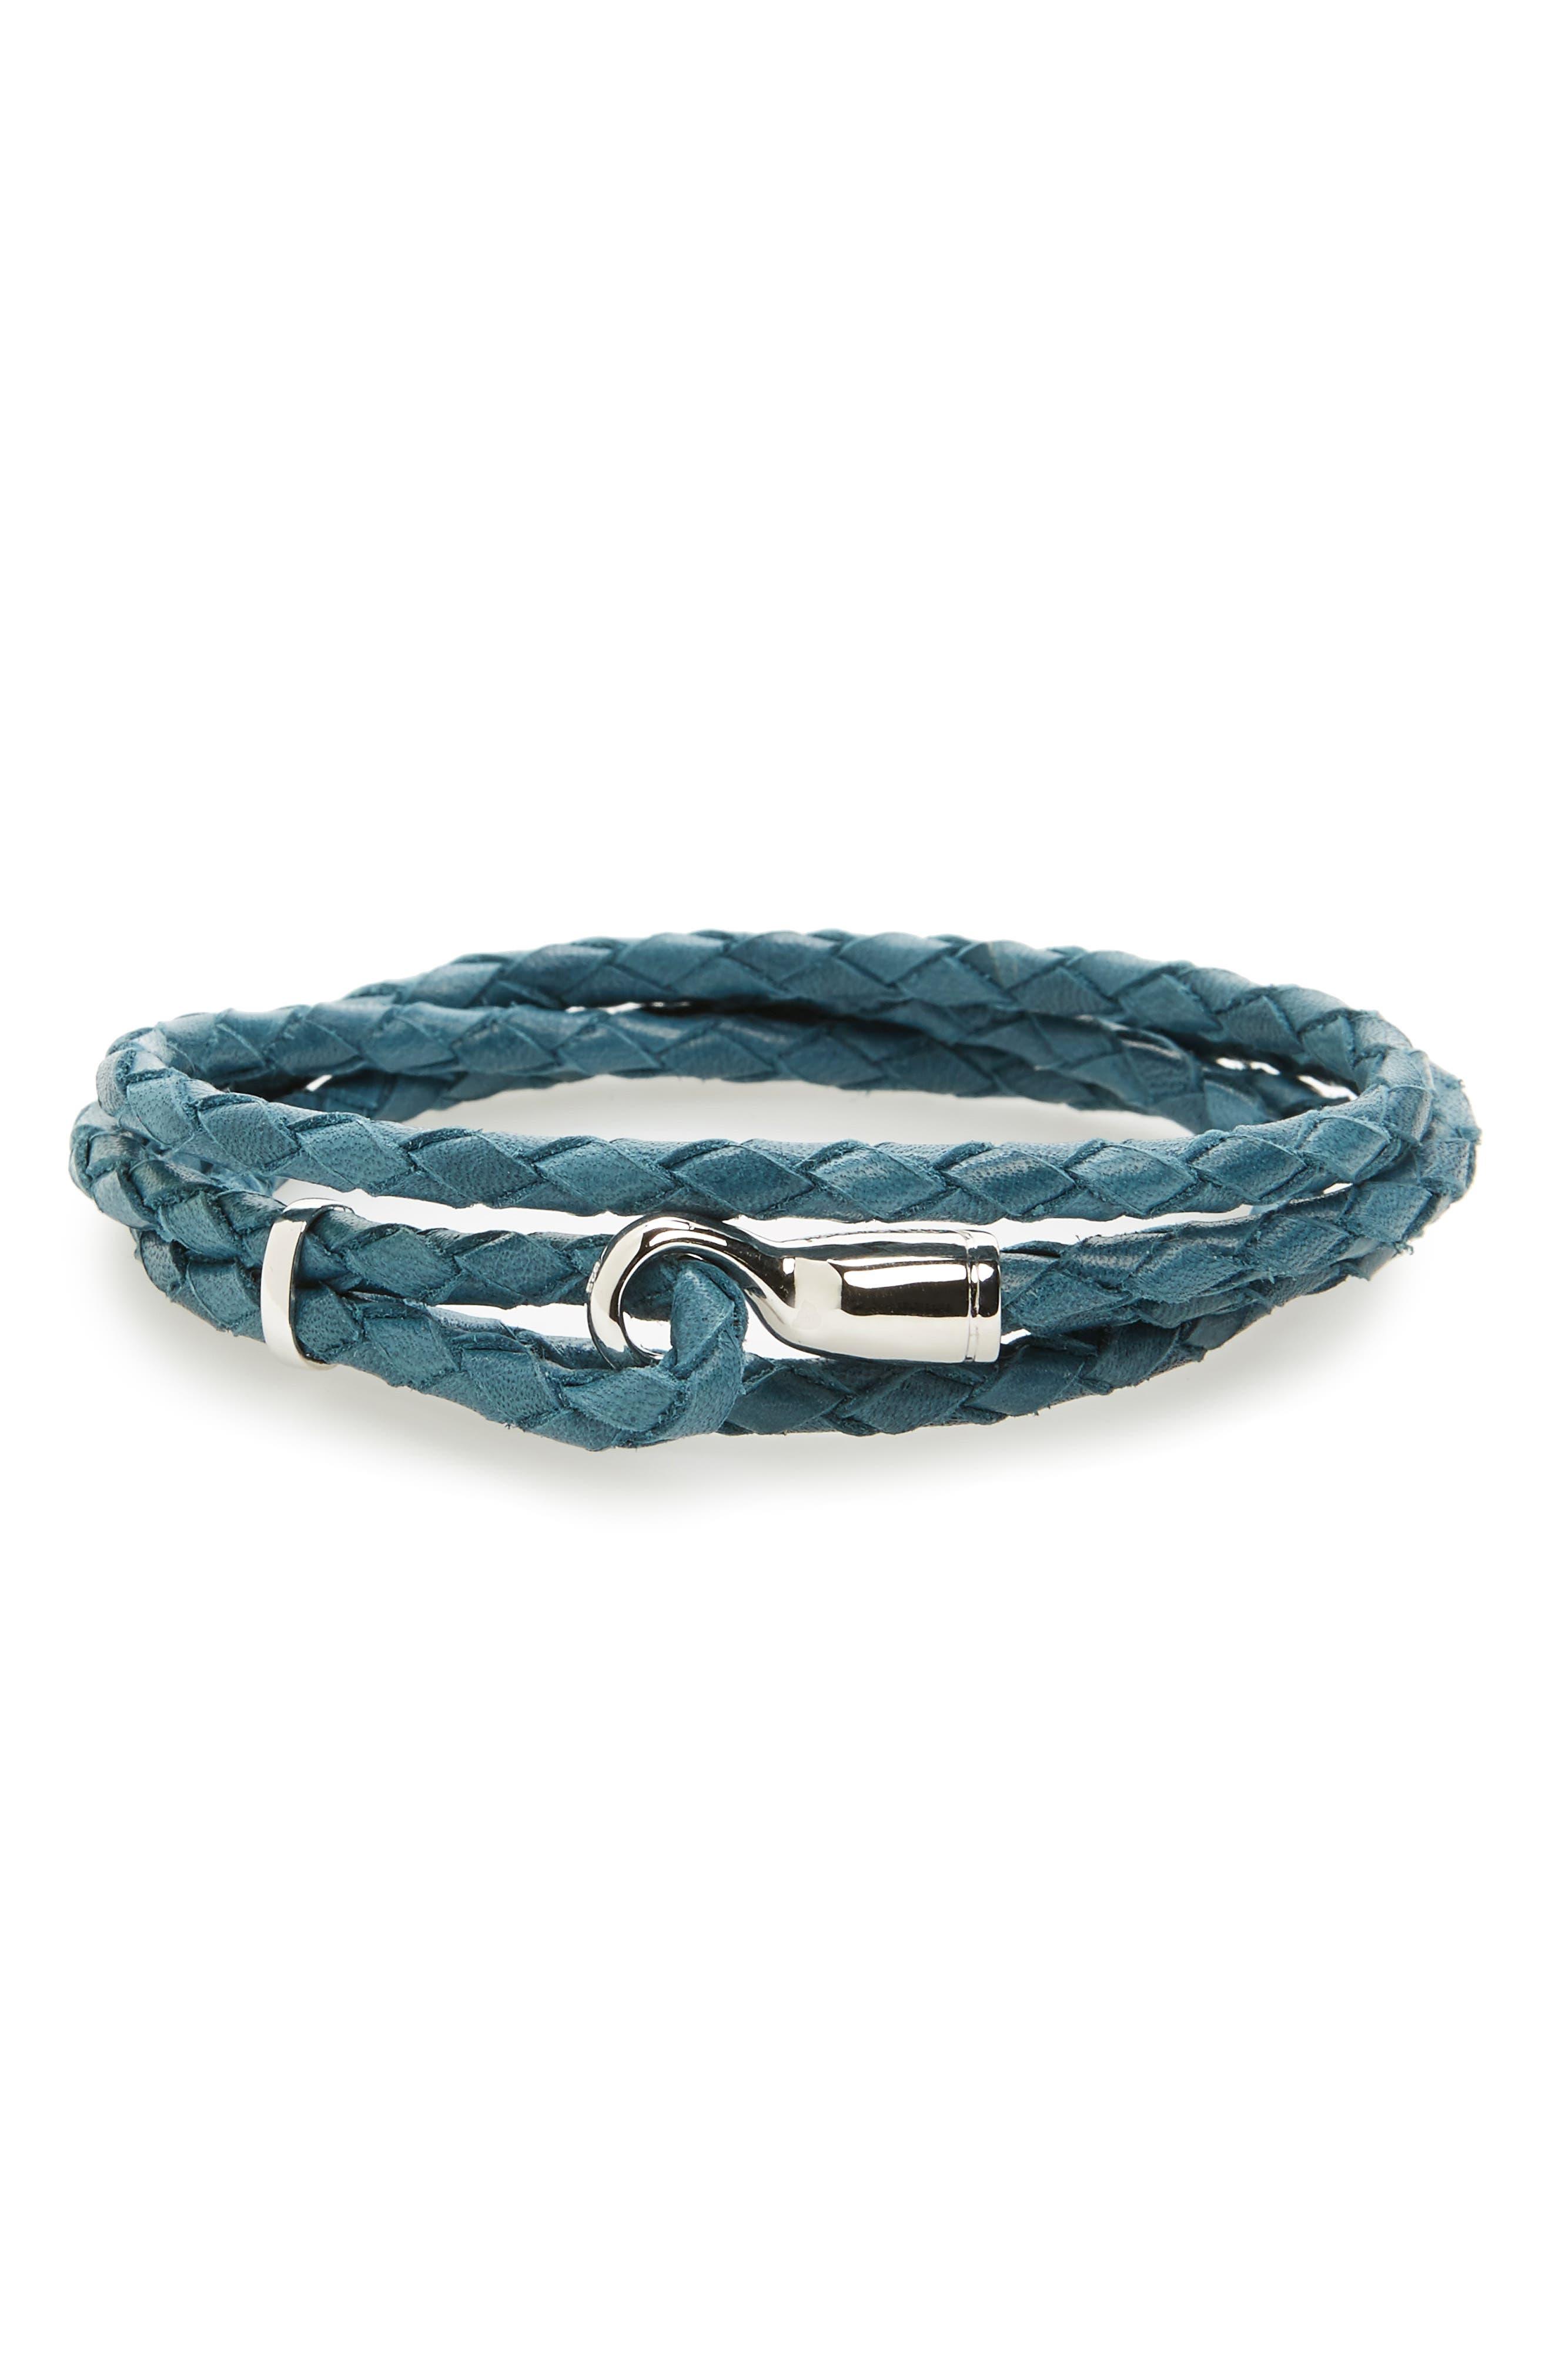 Alternate Image 1 Selected - Miansai Braided Leather Bracelet